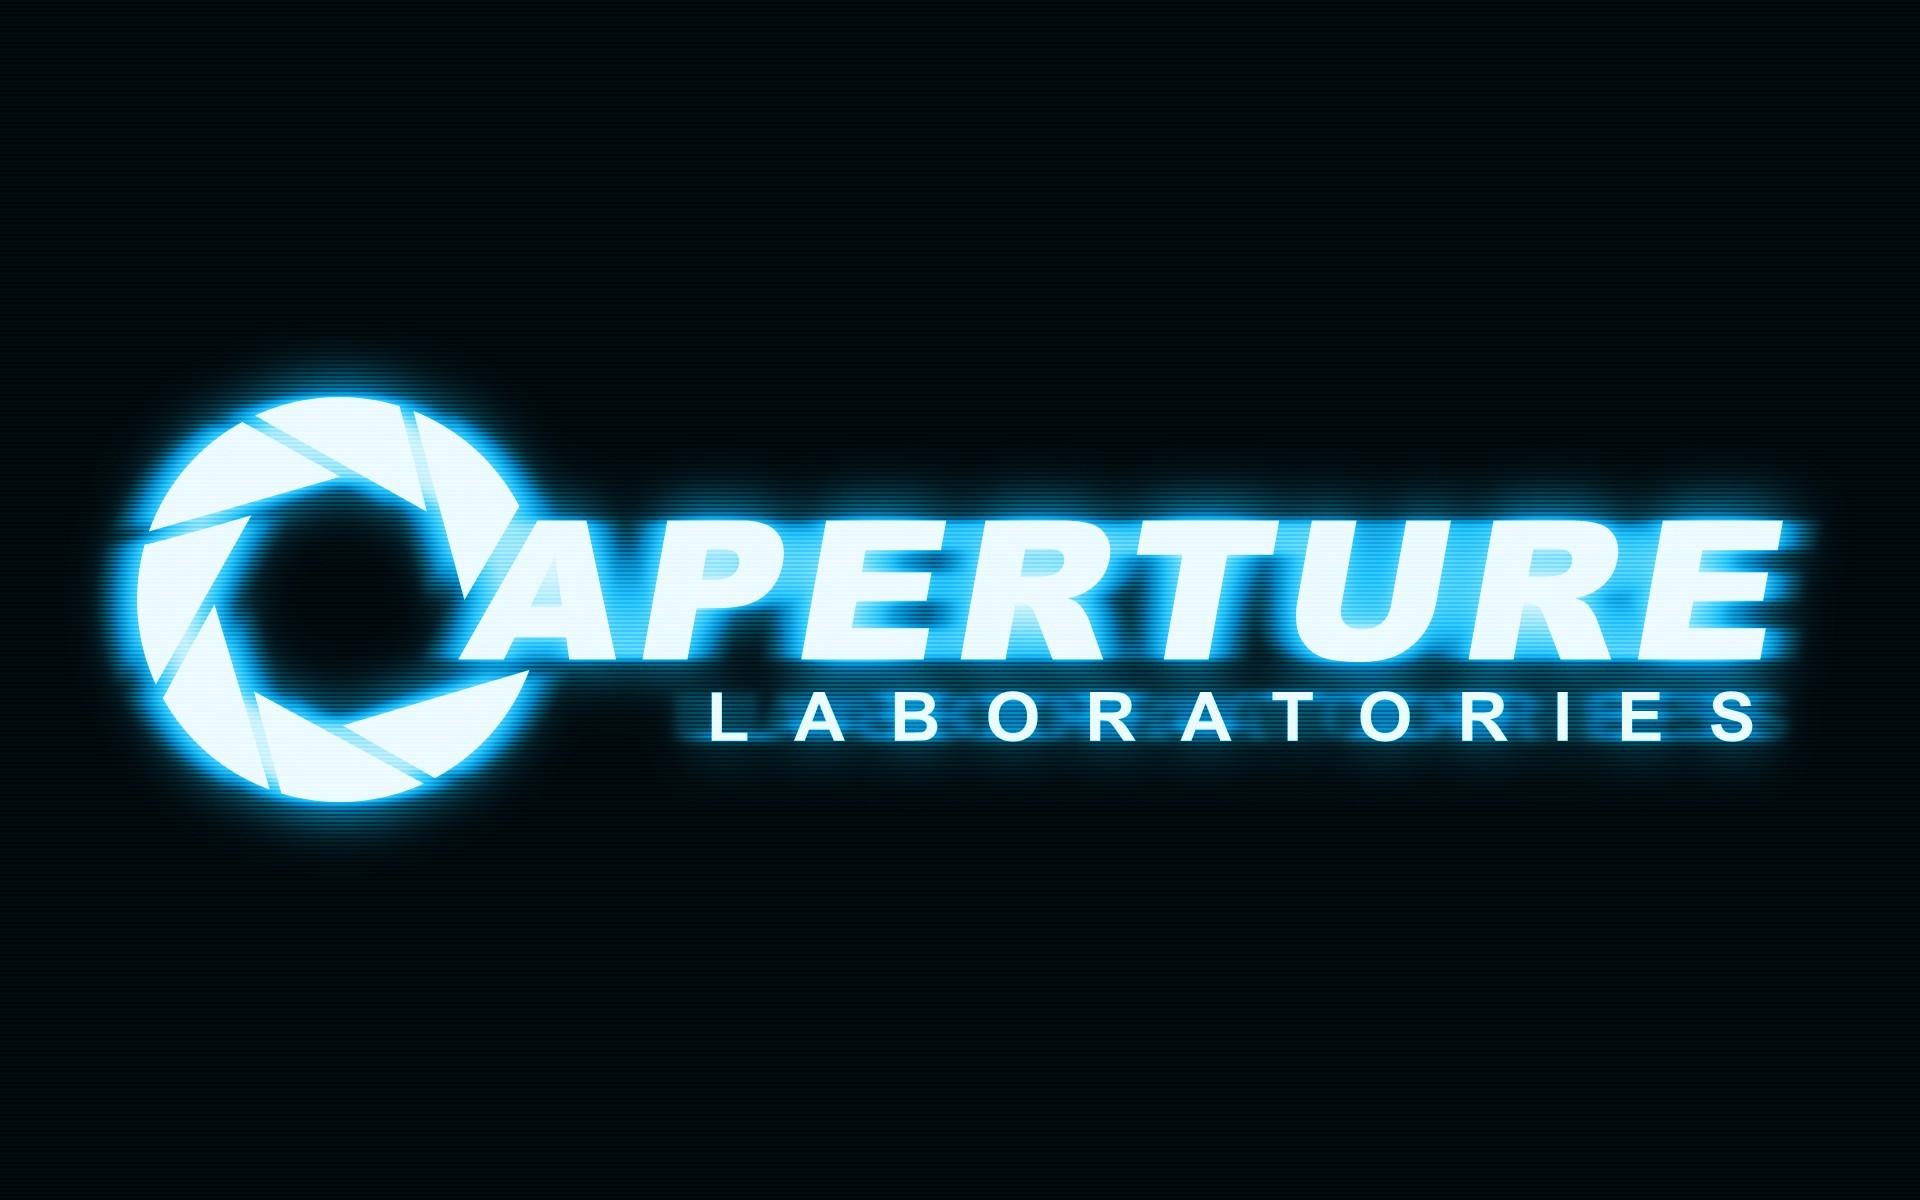 Aperture Laboratories, Portal, Portal 2 Wallpapers HD / Desktop and Mobile  Backgrounds